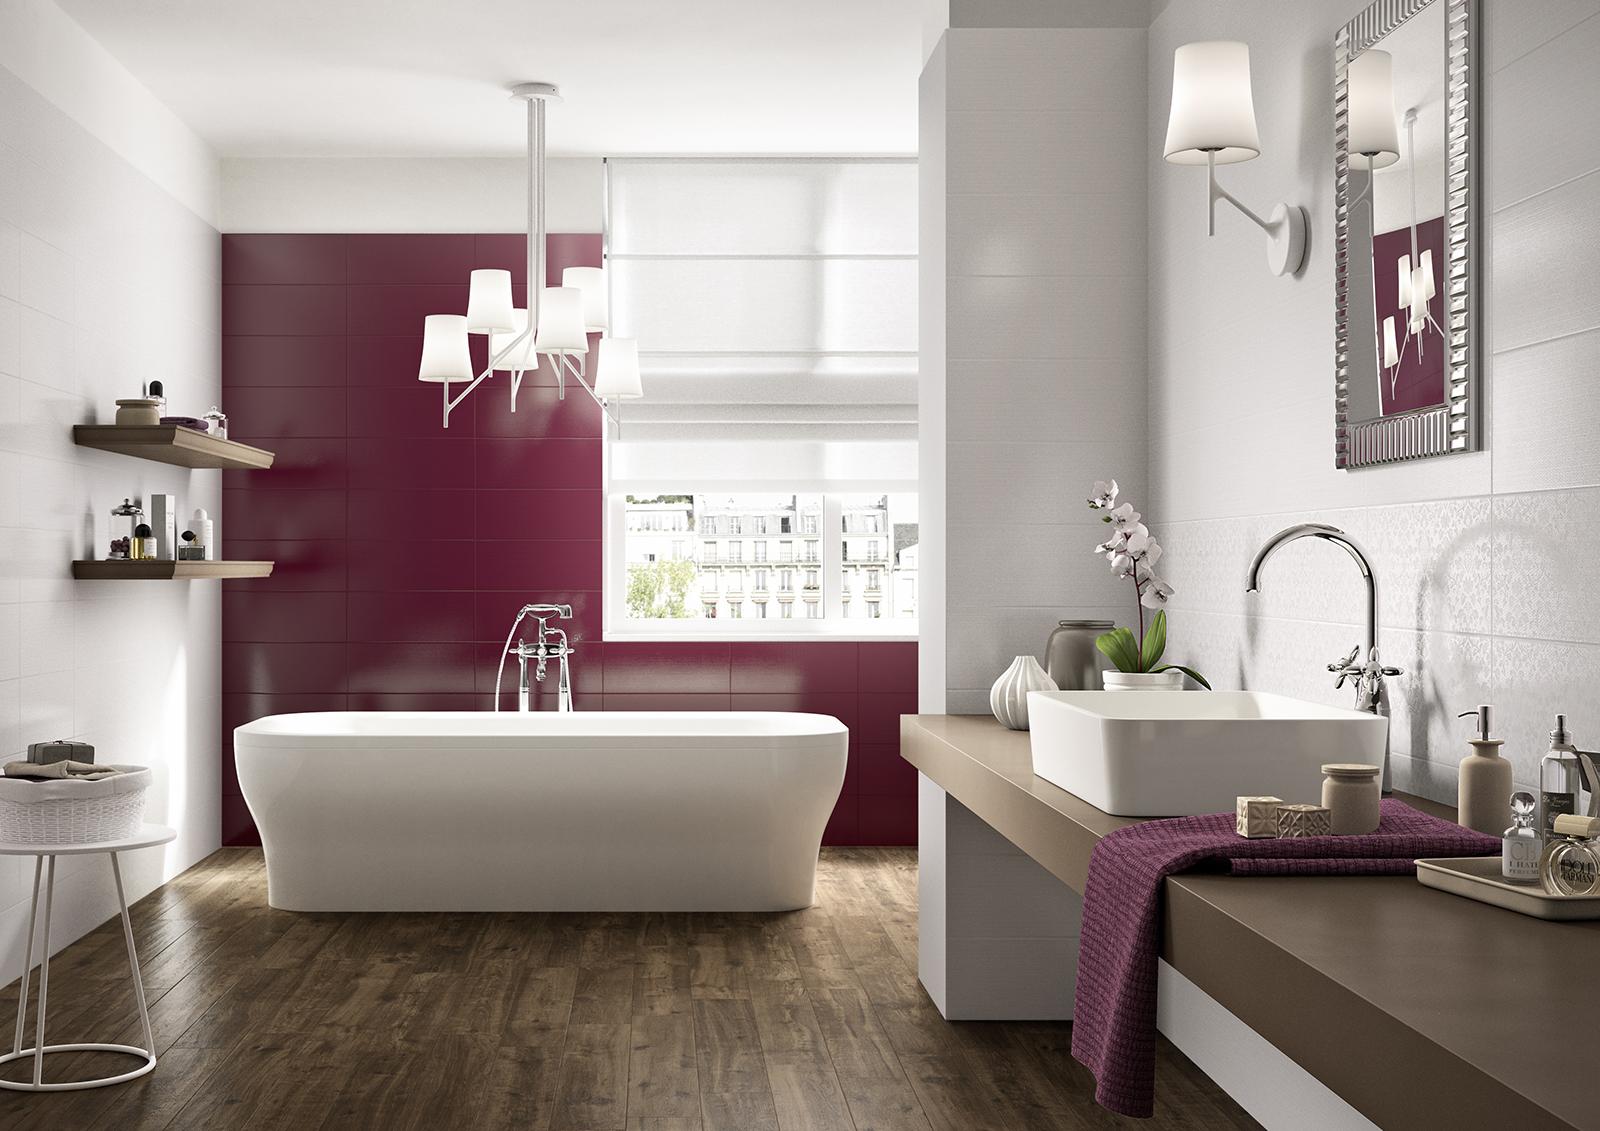 Wohnzimmer grau violett ~ brimob.com for .